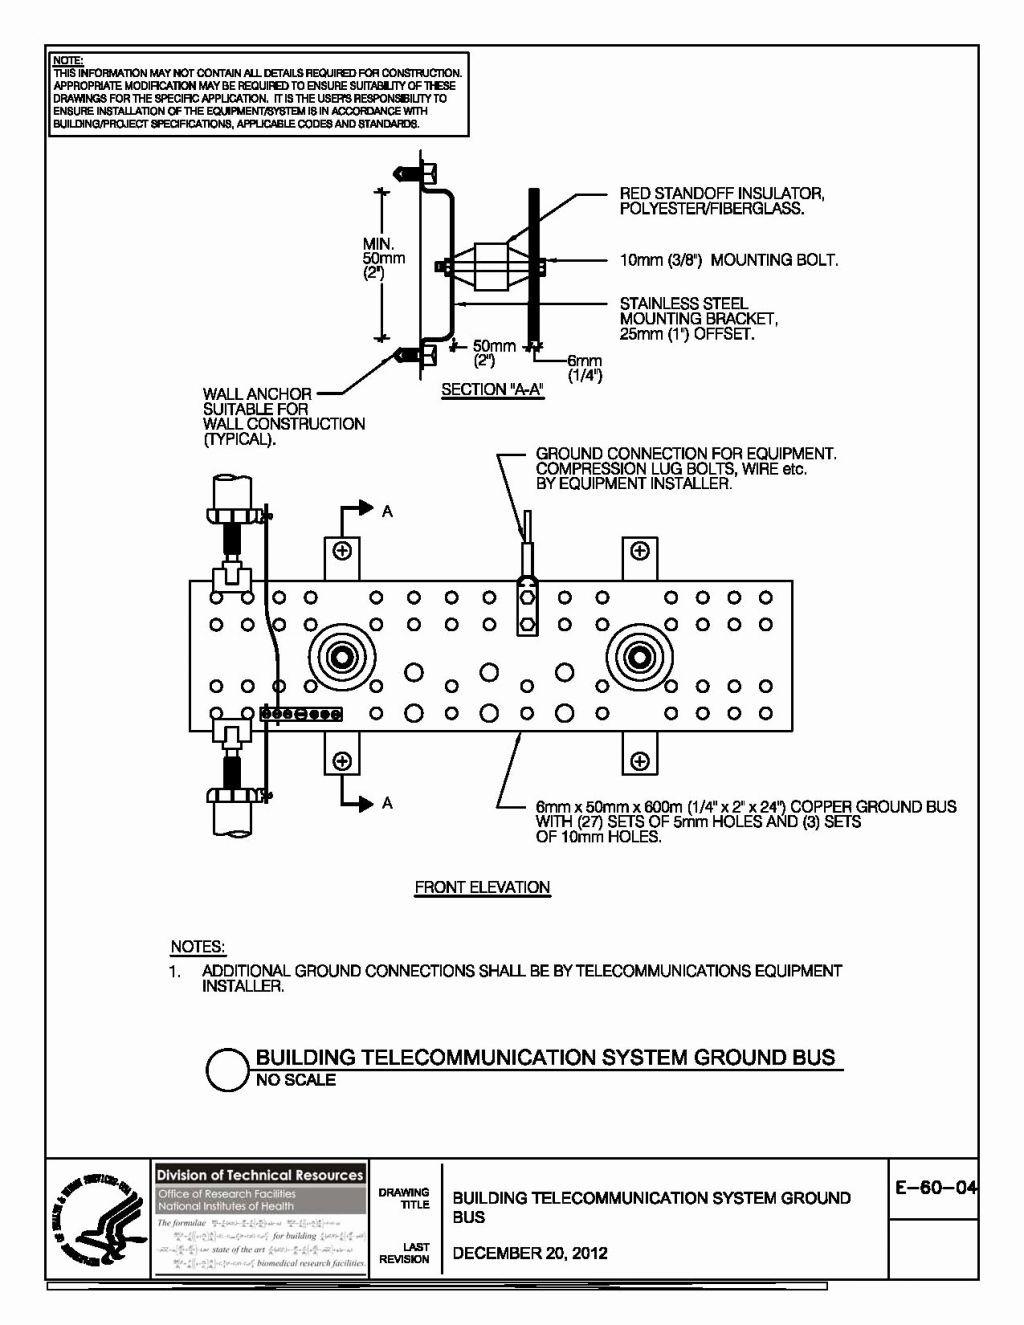 Size of Wiring Diagram Receptacle Wiring Diagram Luxury Nih Standard Cad Details